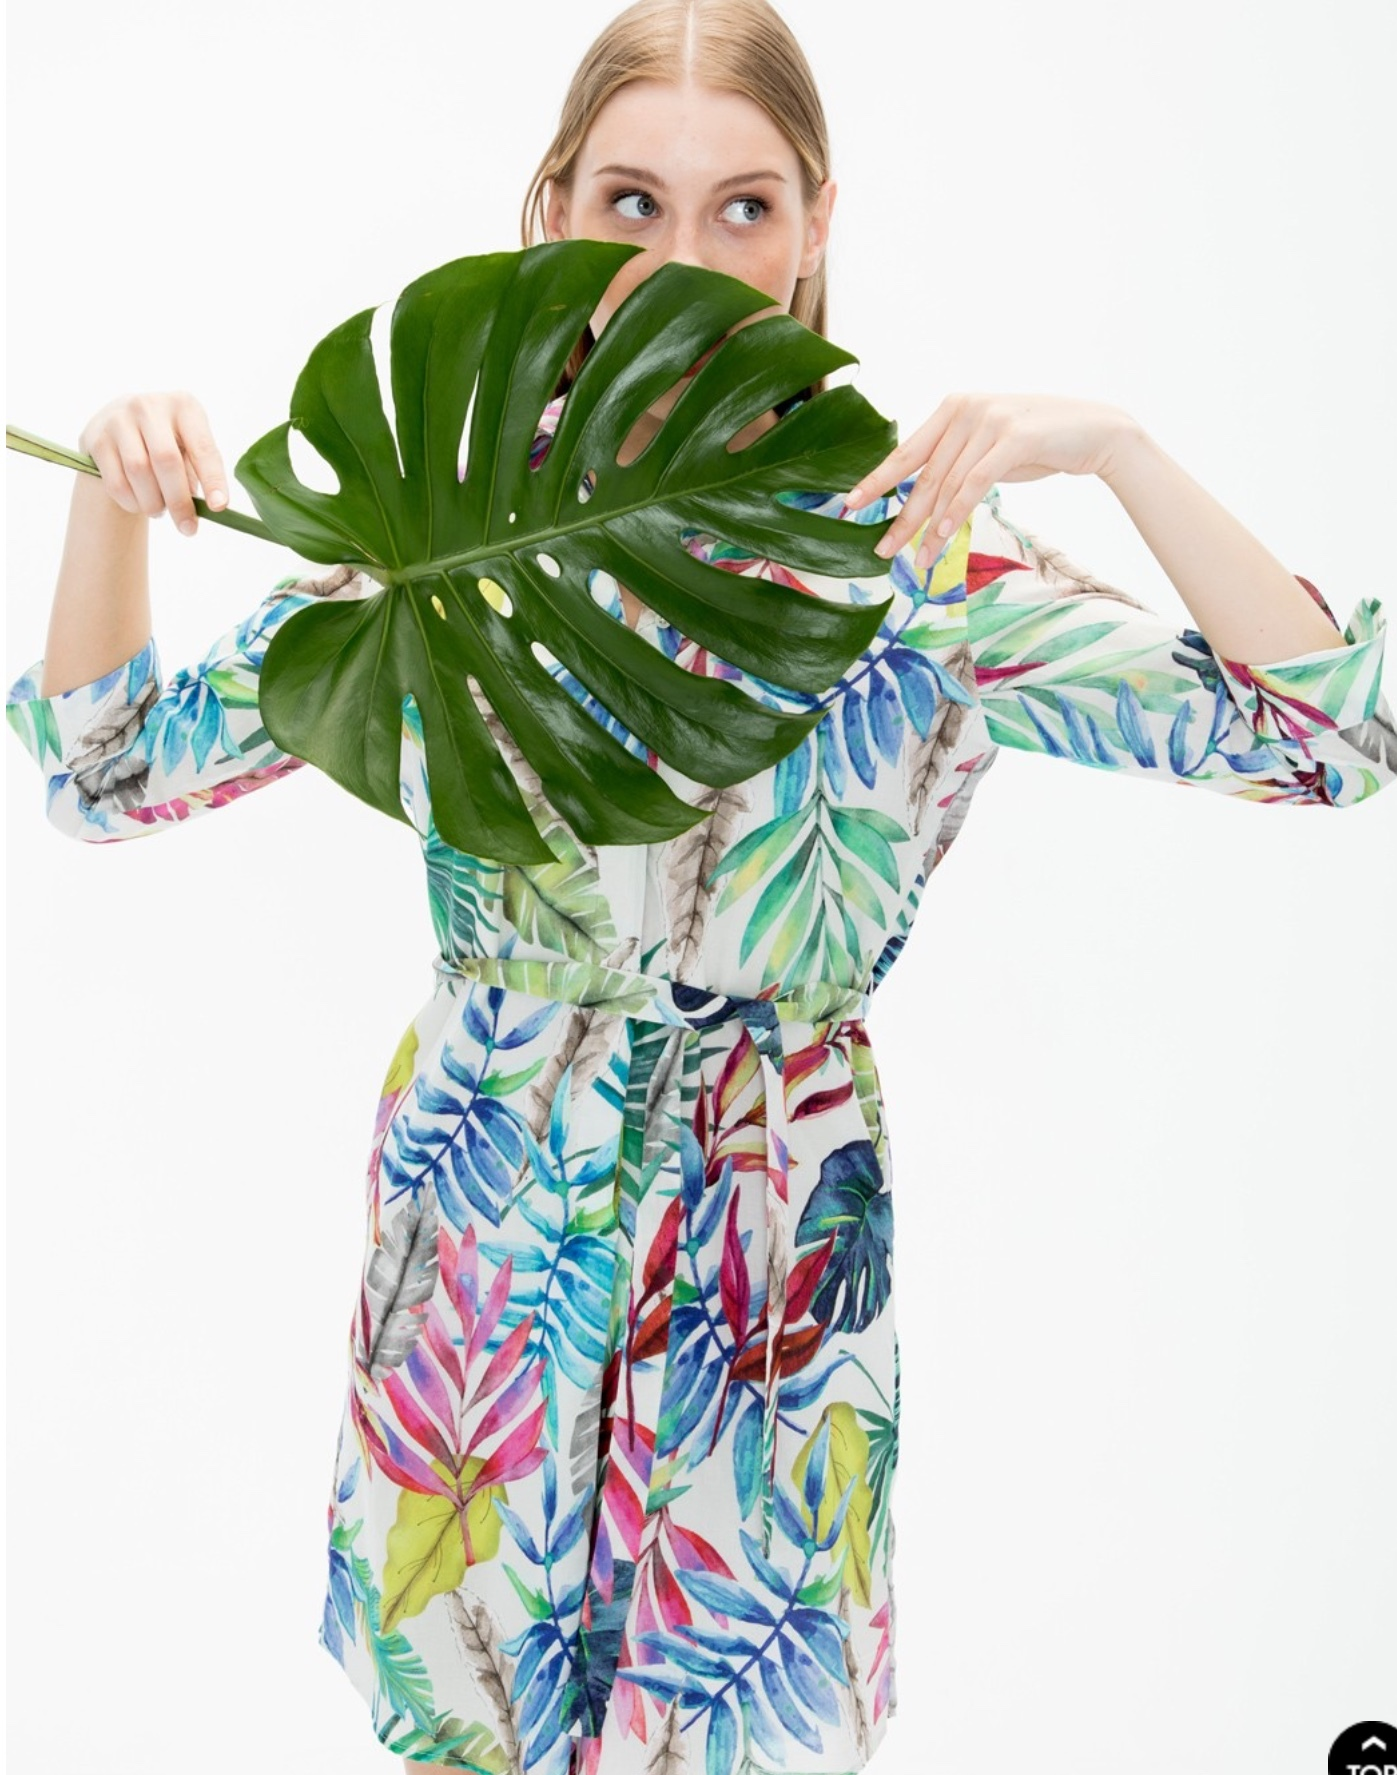 Adrianna Shirt Dress VILLAGALLOADRIANNA